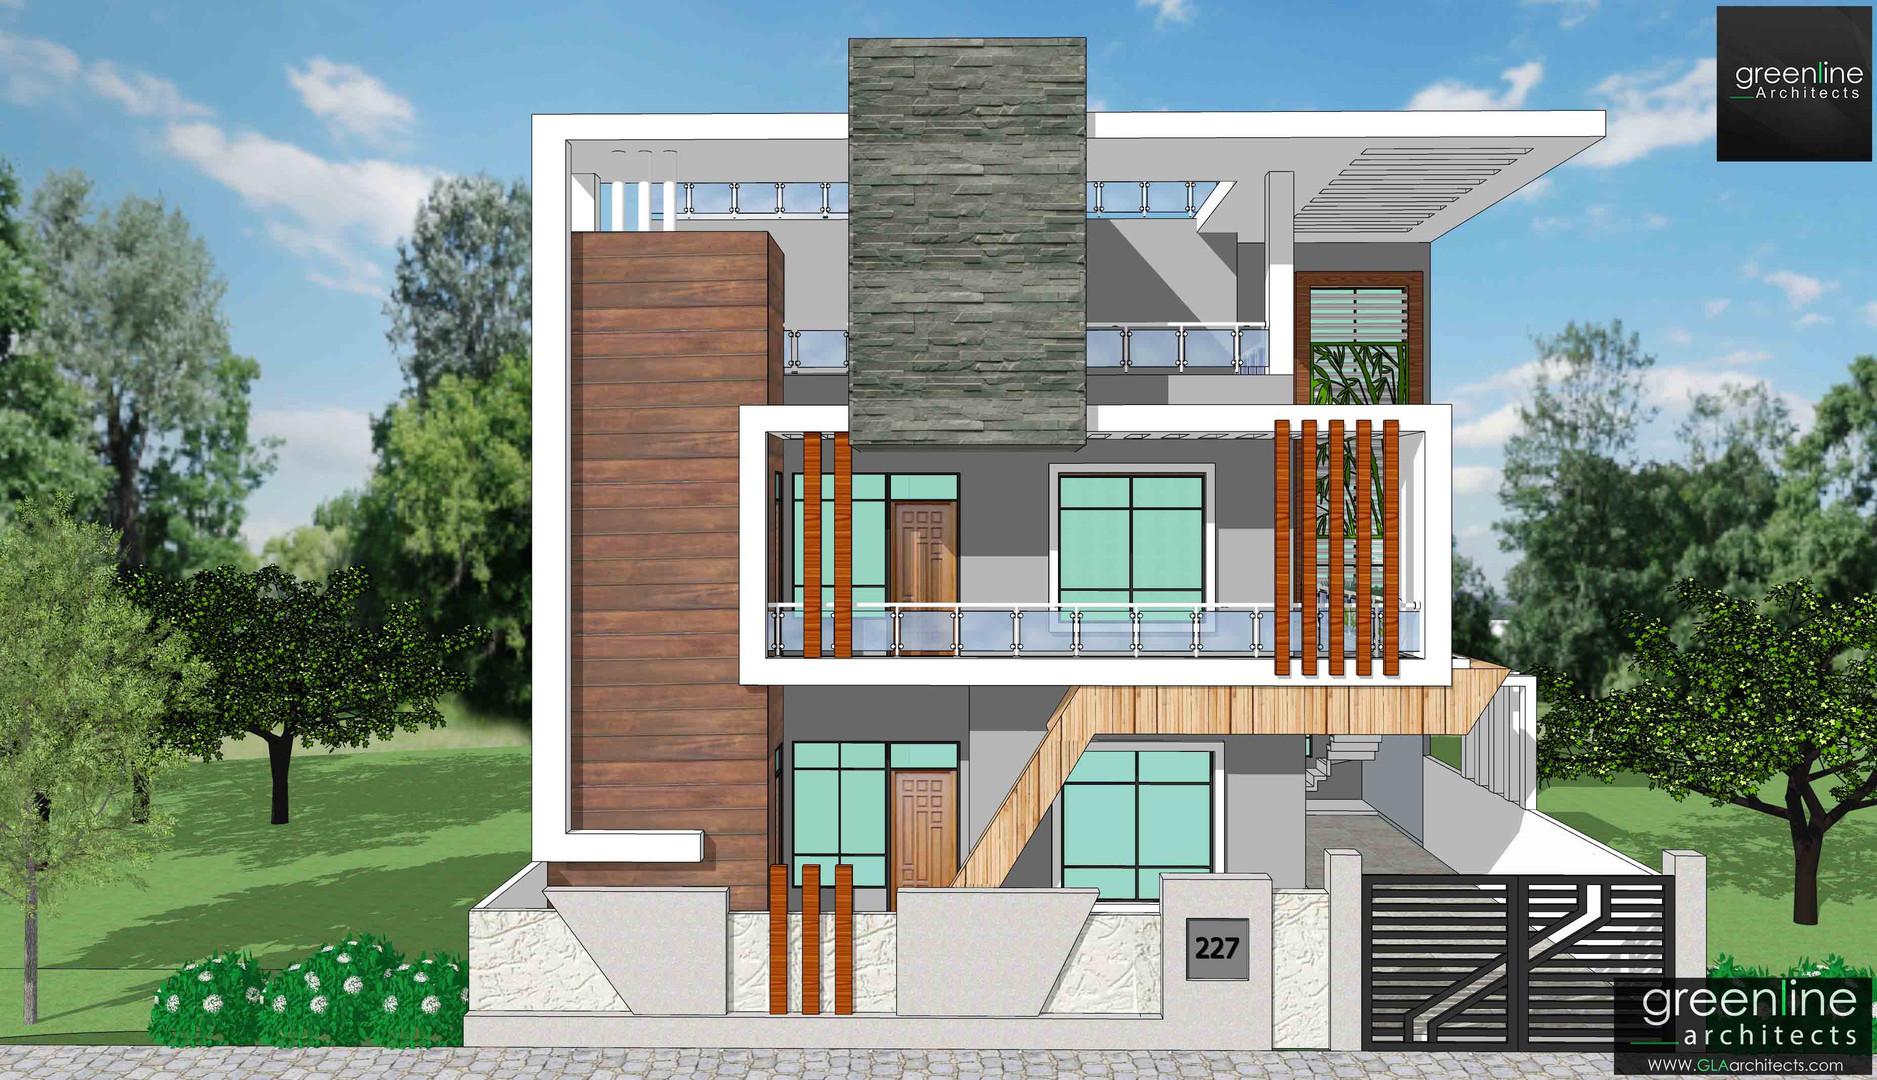 40 X 80 feet house design in Gomti Nagar, Lucknow